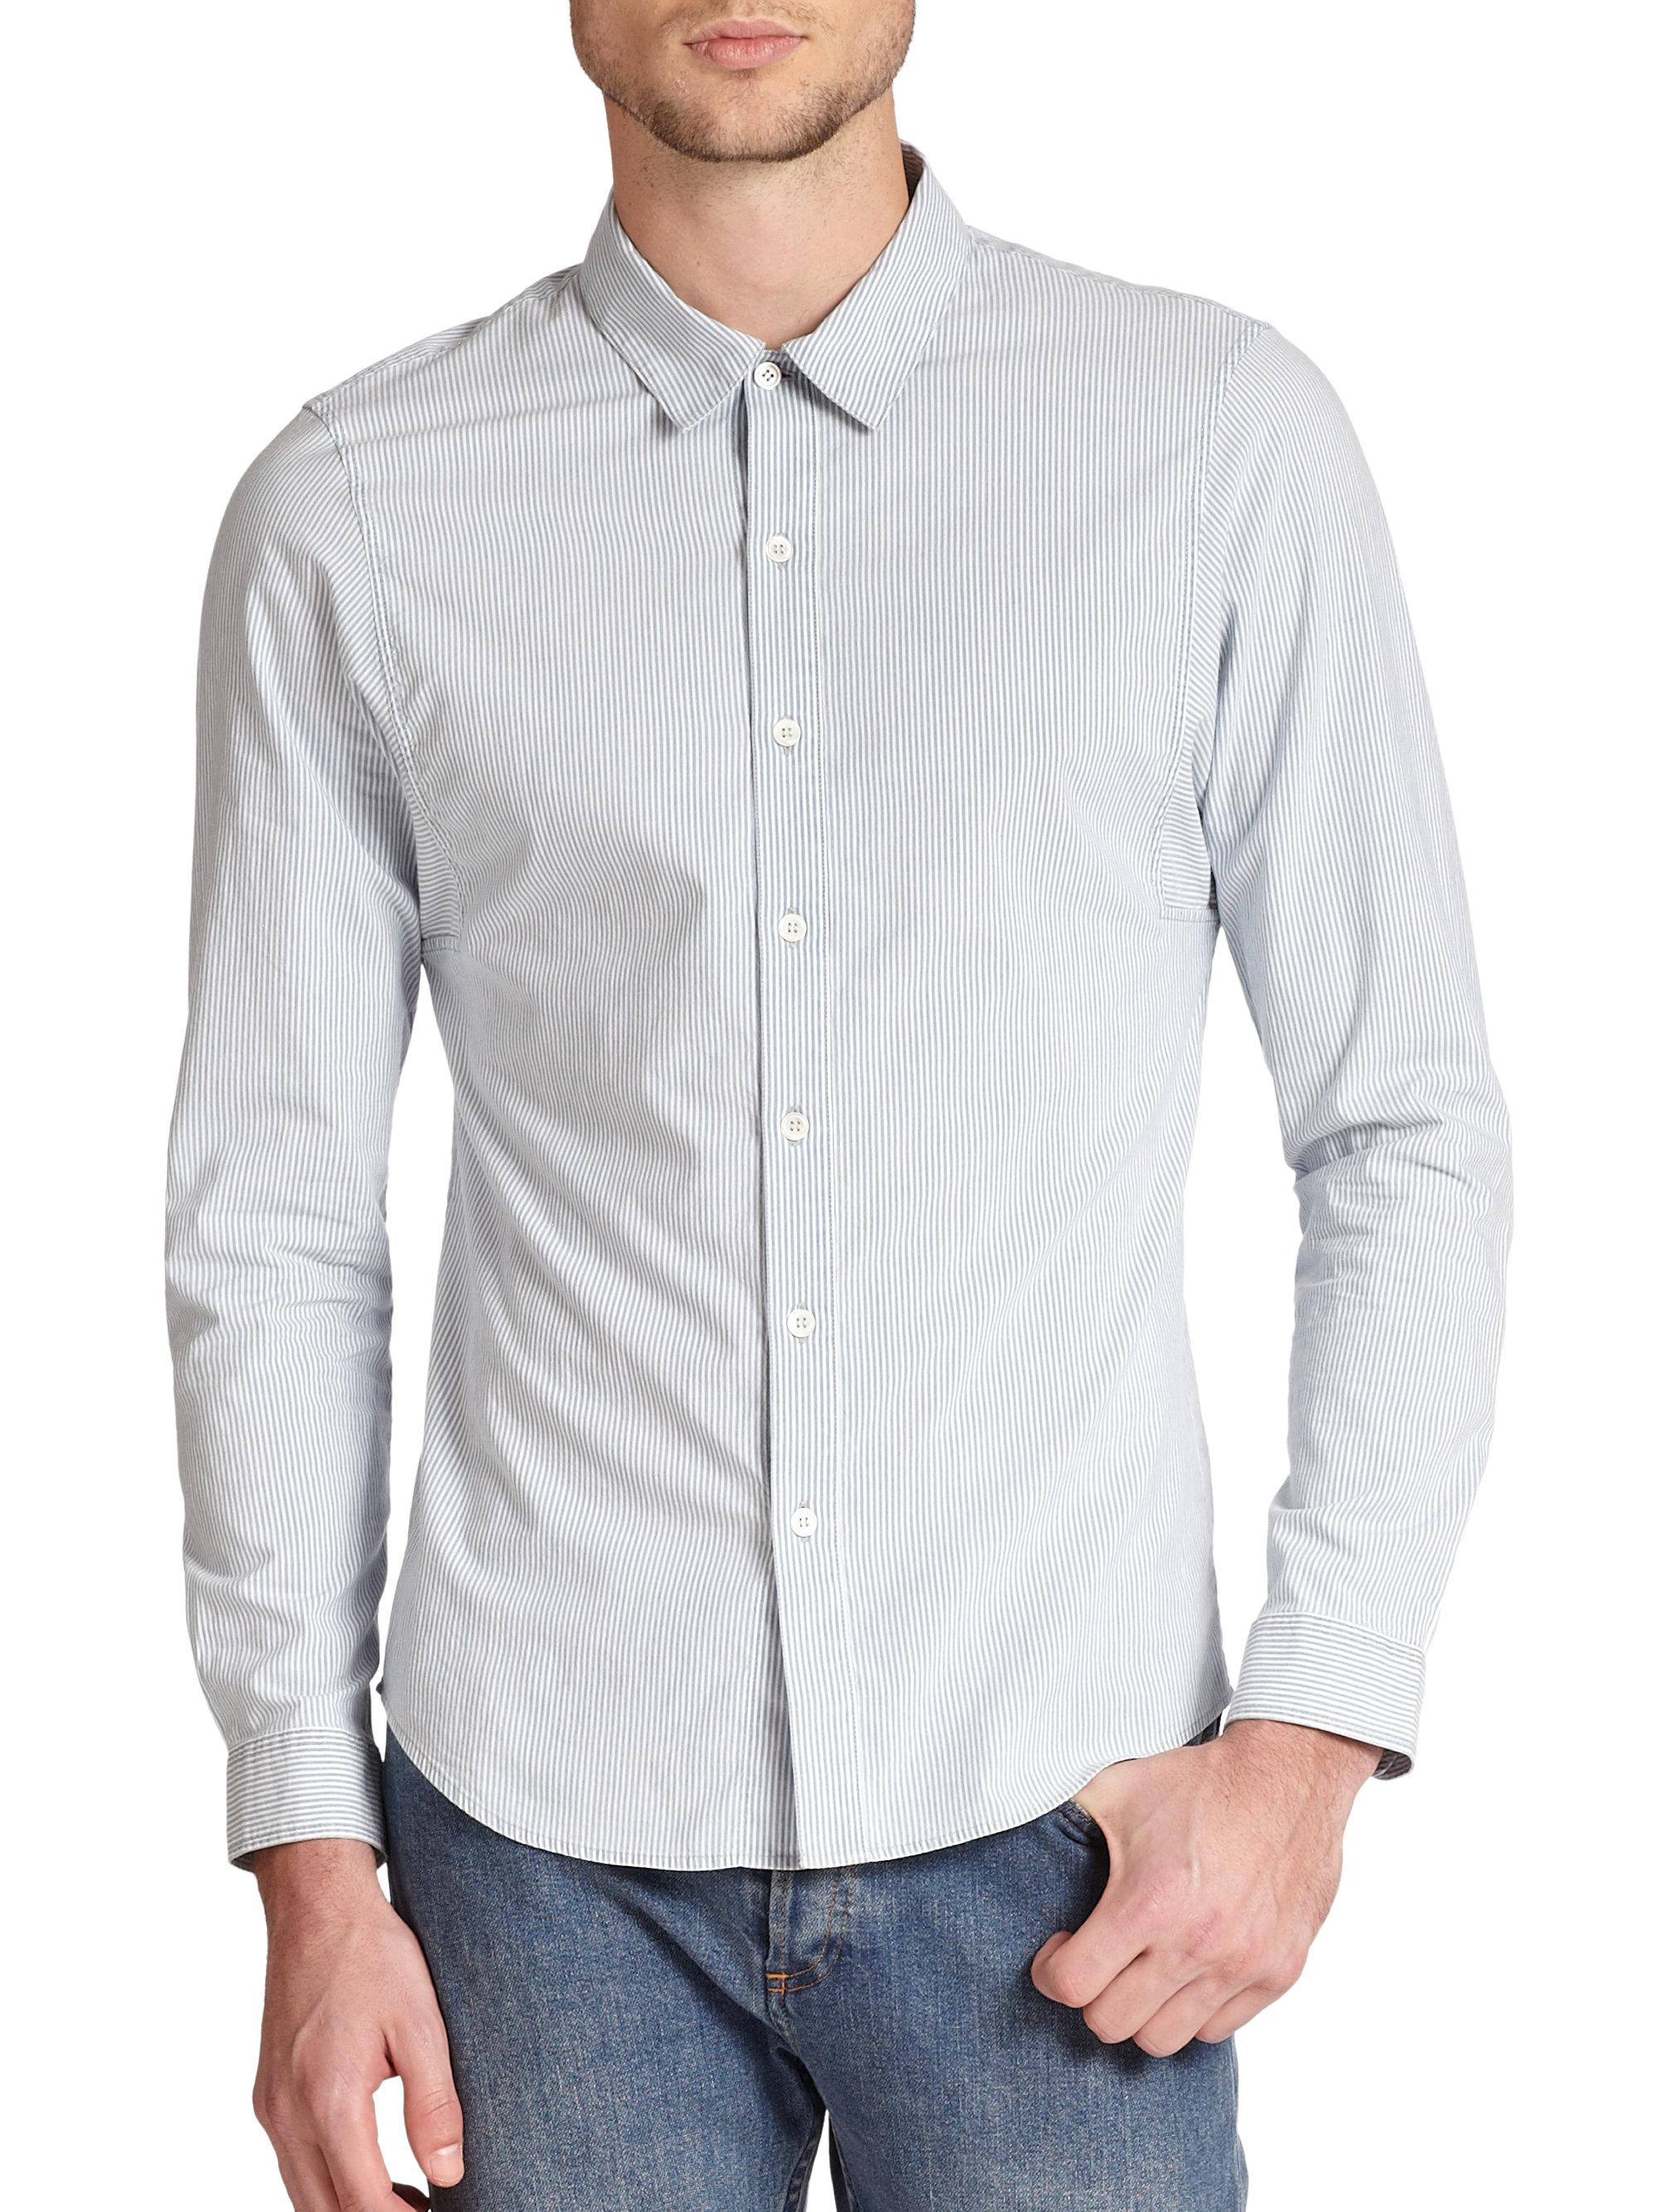 A P C Classic Slim Fit Pinstripe Cotton Sportshirt In